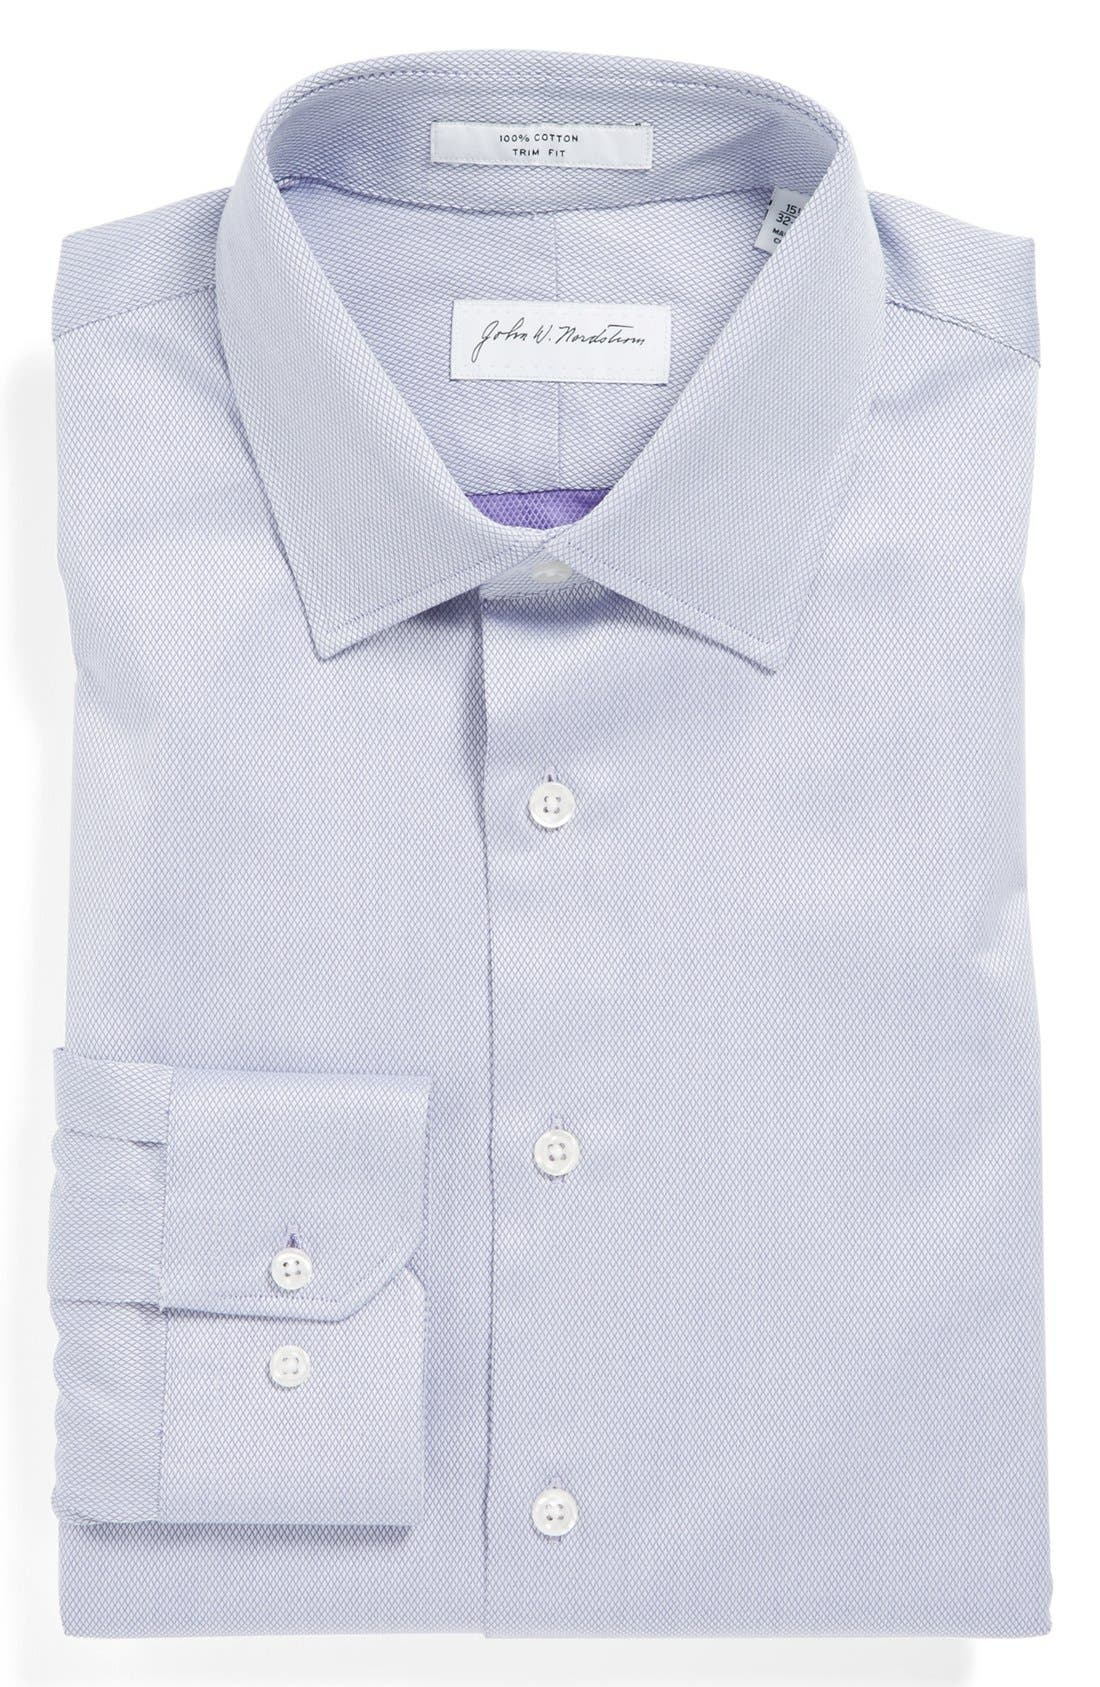 John W. Nordstromu00ae Trim Fit Cotton Dress Shirt | Nordstrom